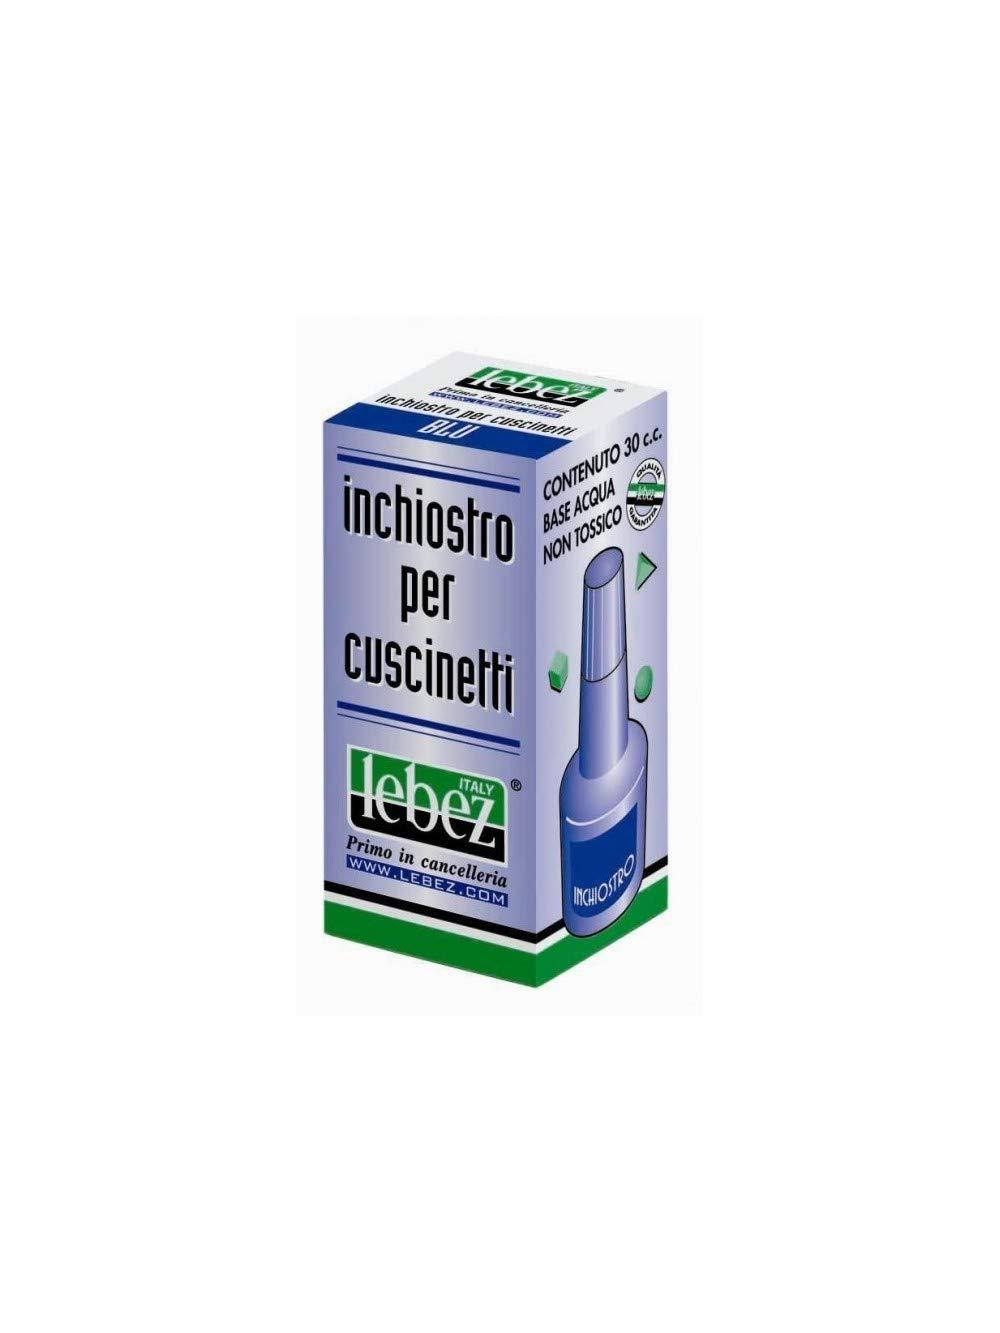 Lebez 1483-BL Inchiostro per cuscinett, 30 cc, Blu